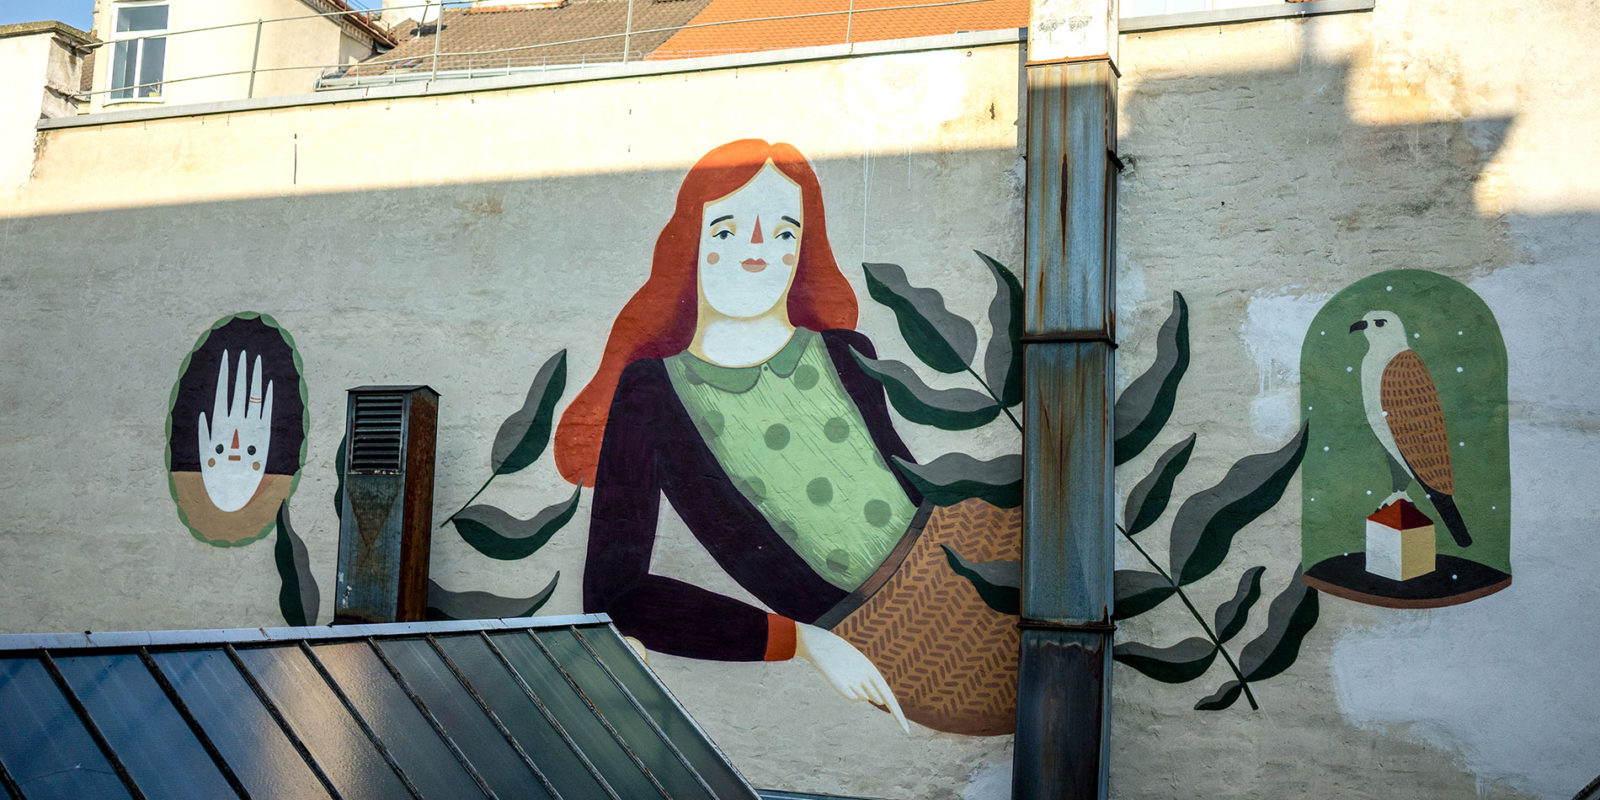 FRAU_ISA_mural_graffiti1